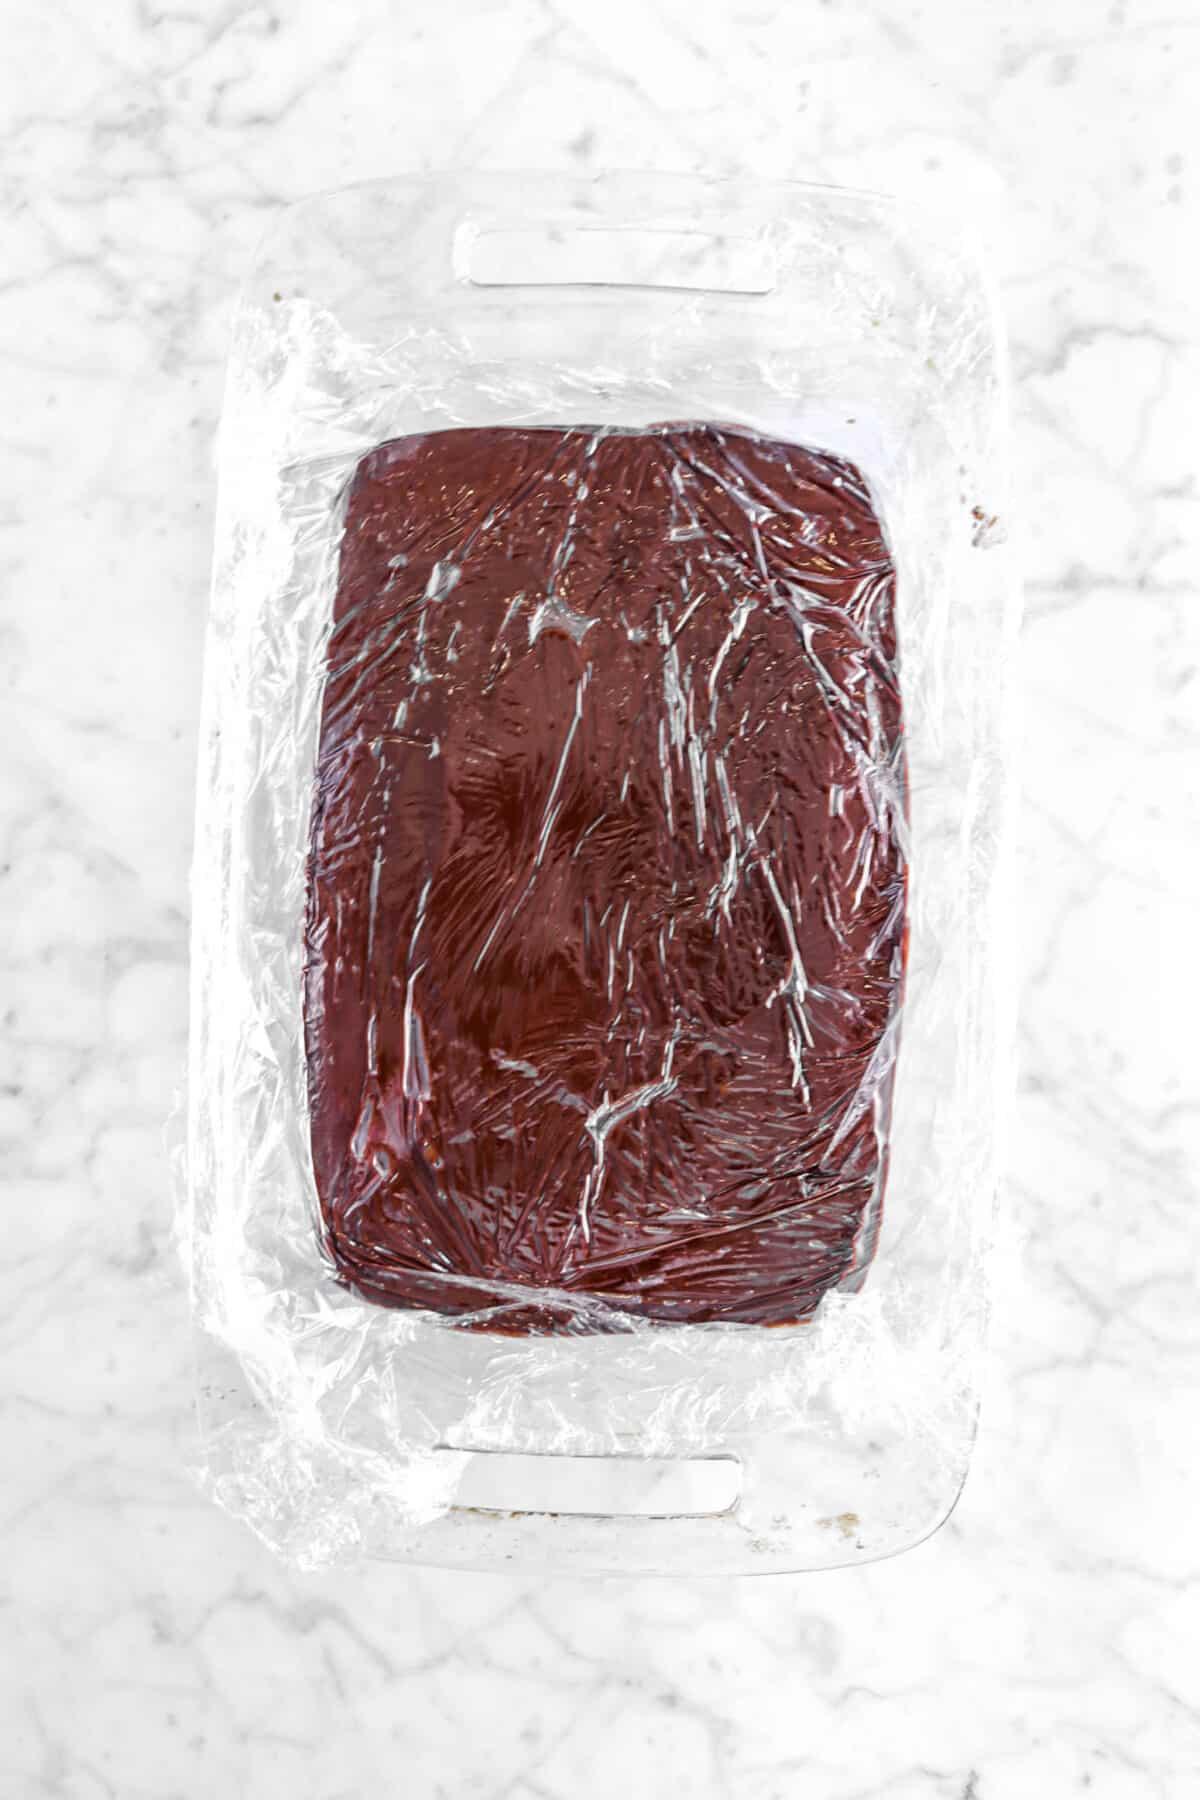 plastic wrap over ganache filling